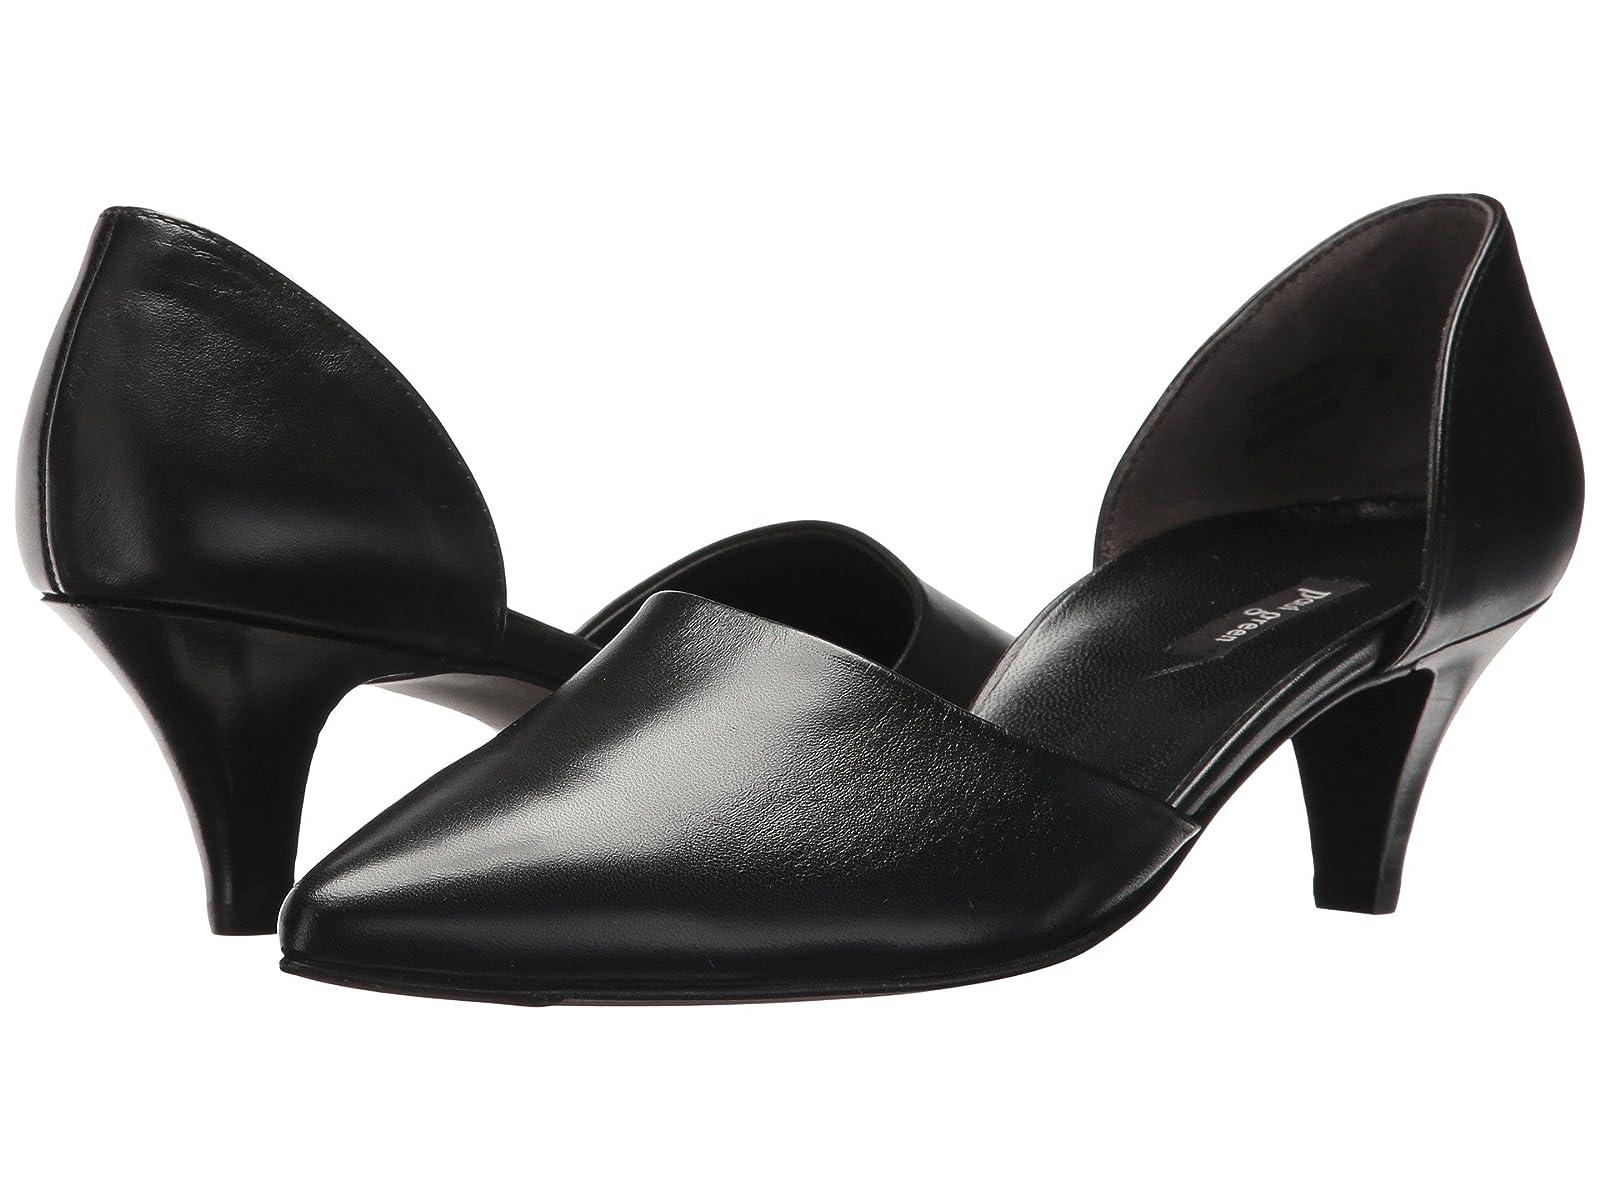 Paul Green JuliaCheap and distinctive eye-catching shoes